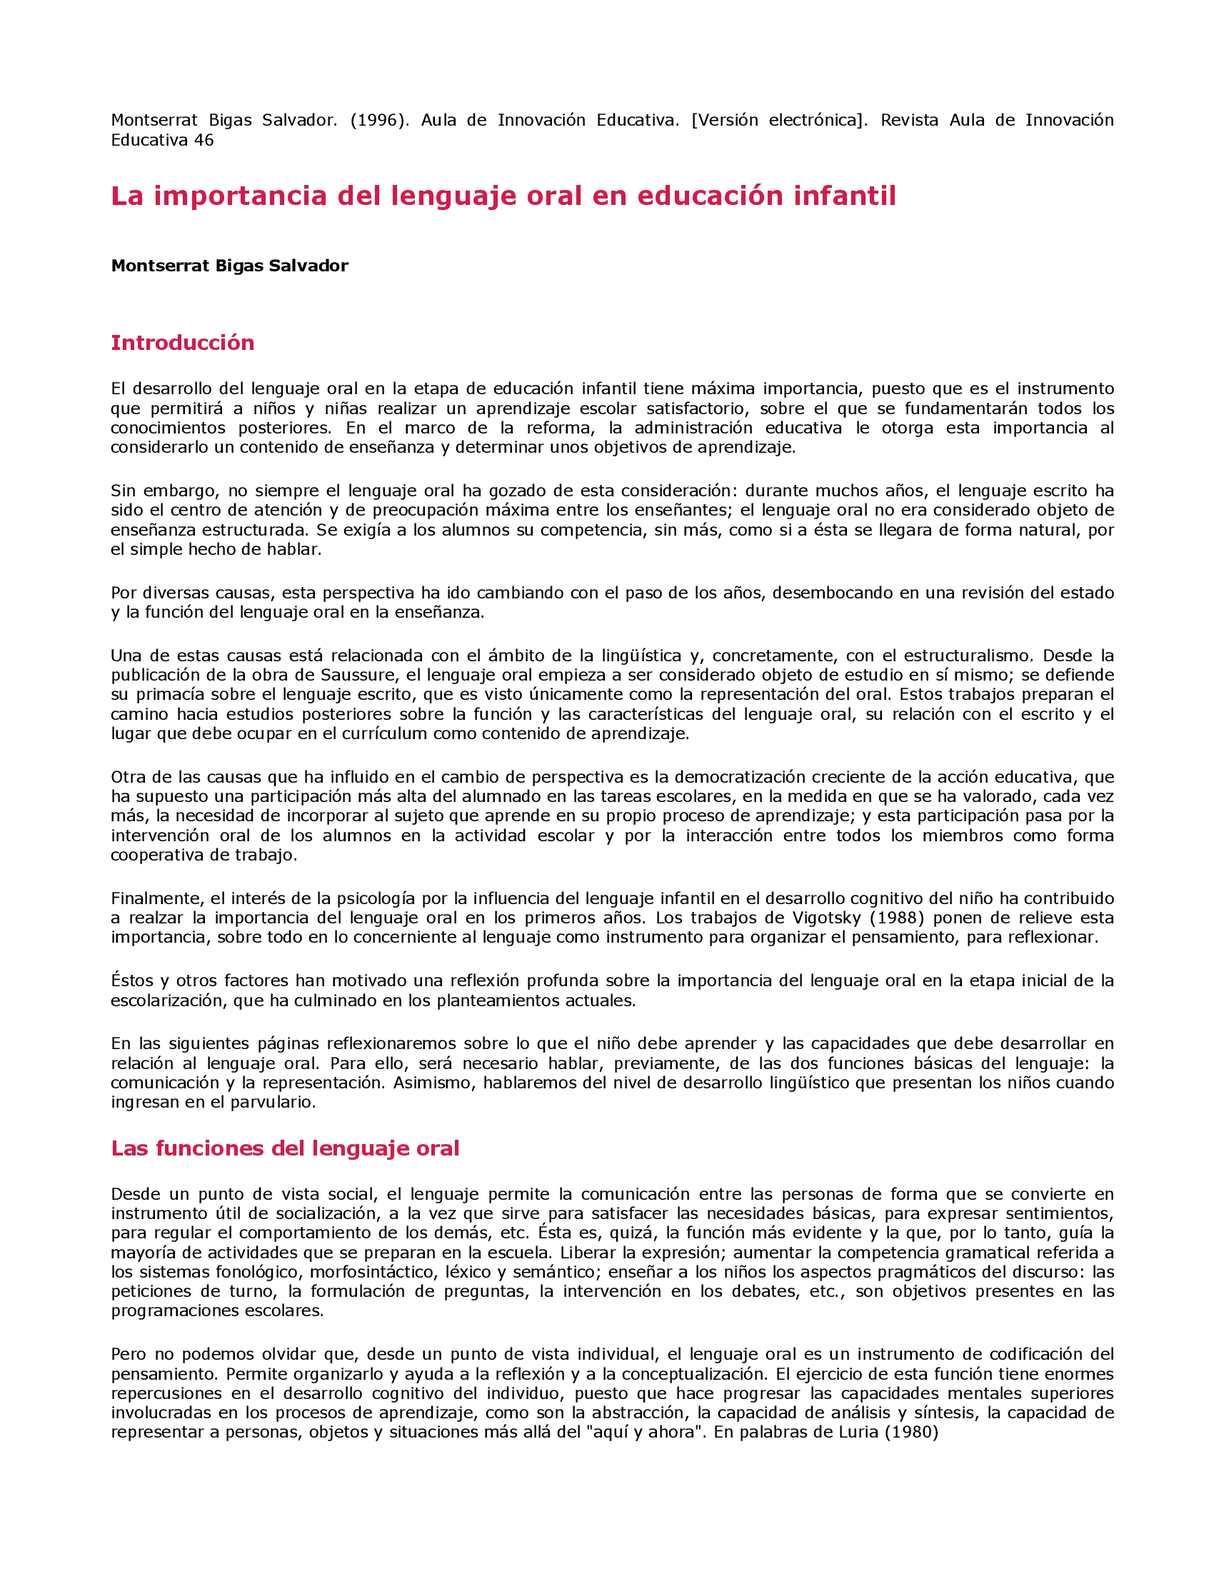 Calaméo - La Importancia Del Lenguaje Oral En Educacion Infantil